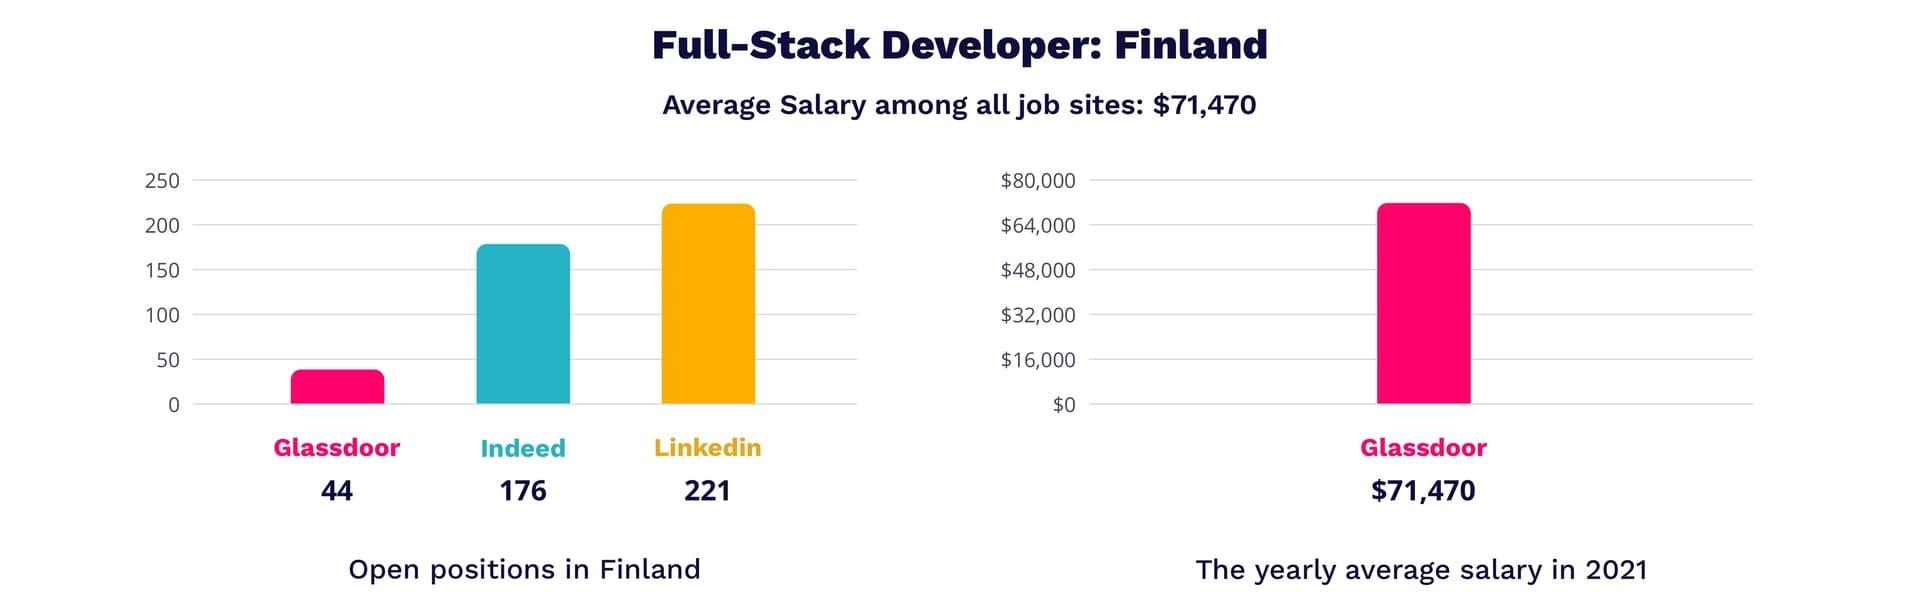 Full-stack developer salary in Finland